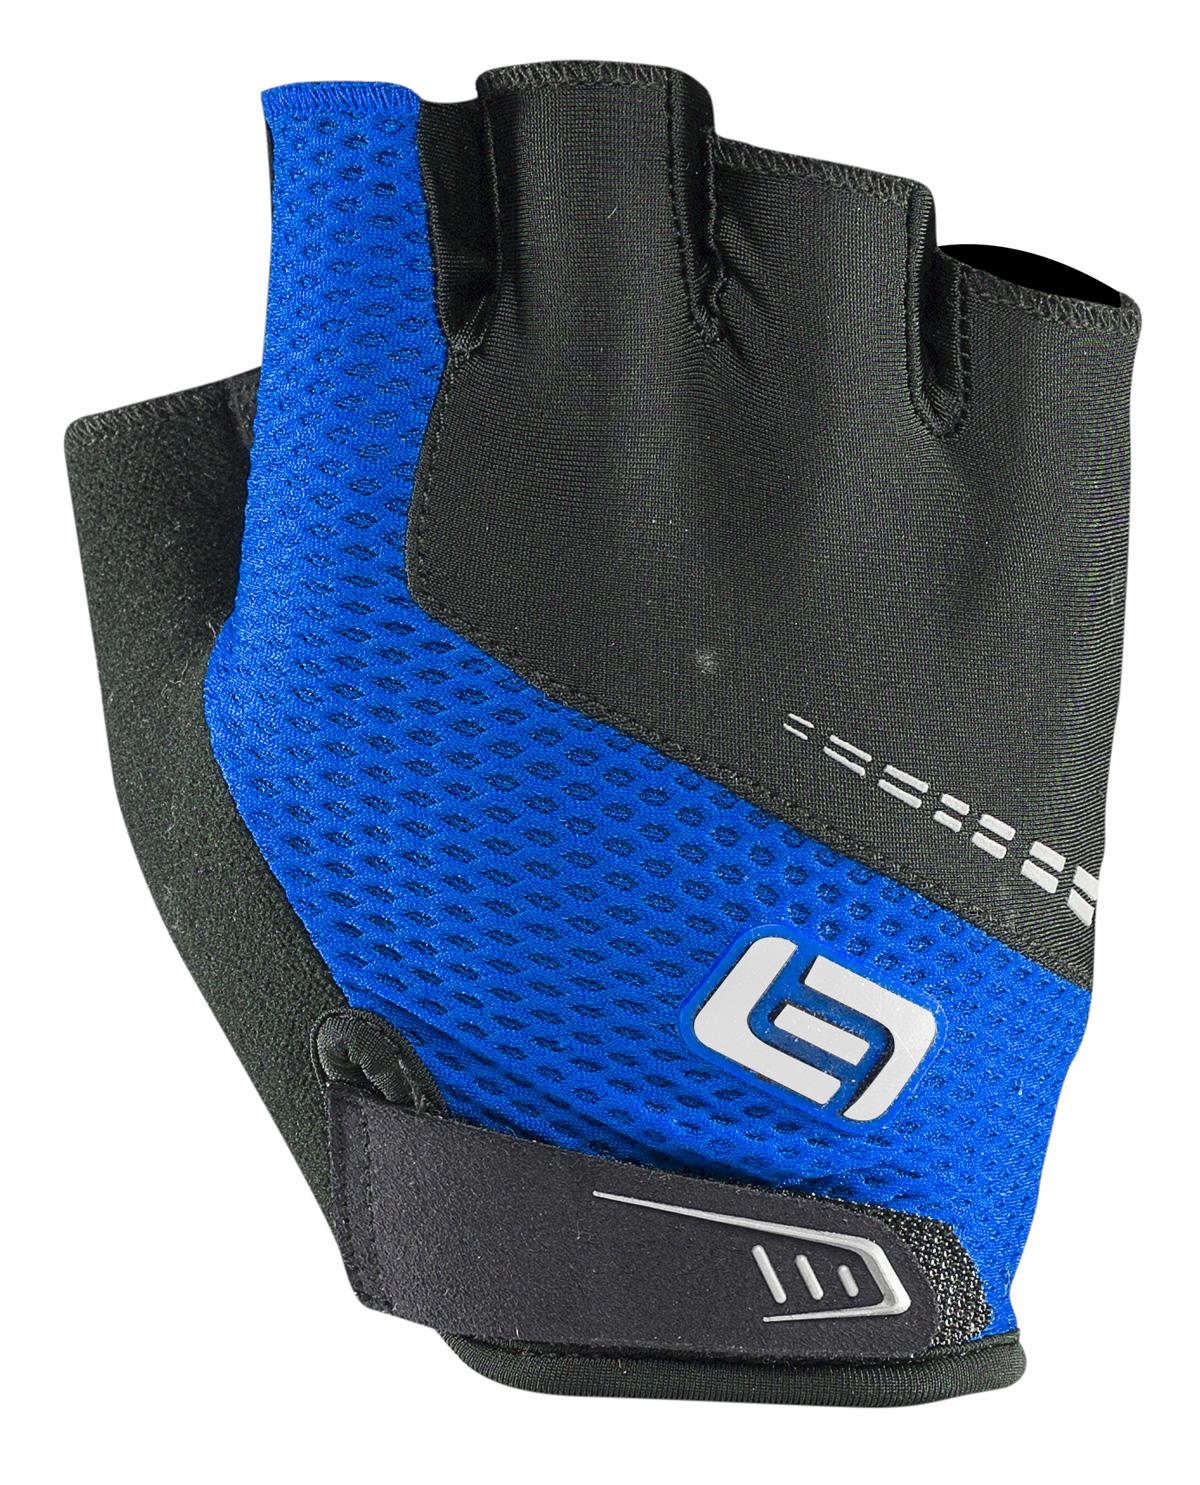 Bellwether Womens Gel Flex CYCLING GLOVES Gel Palm Glove Extra Large Blue